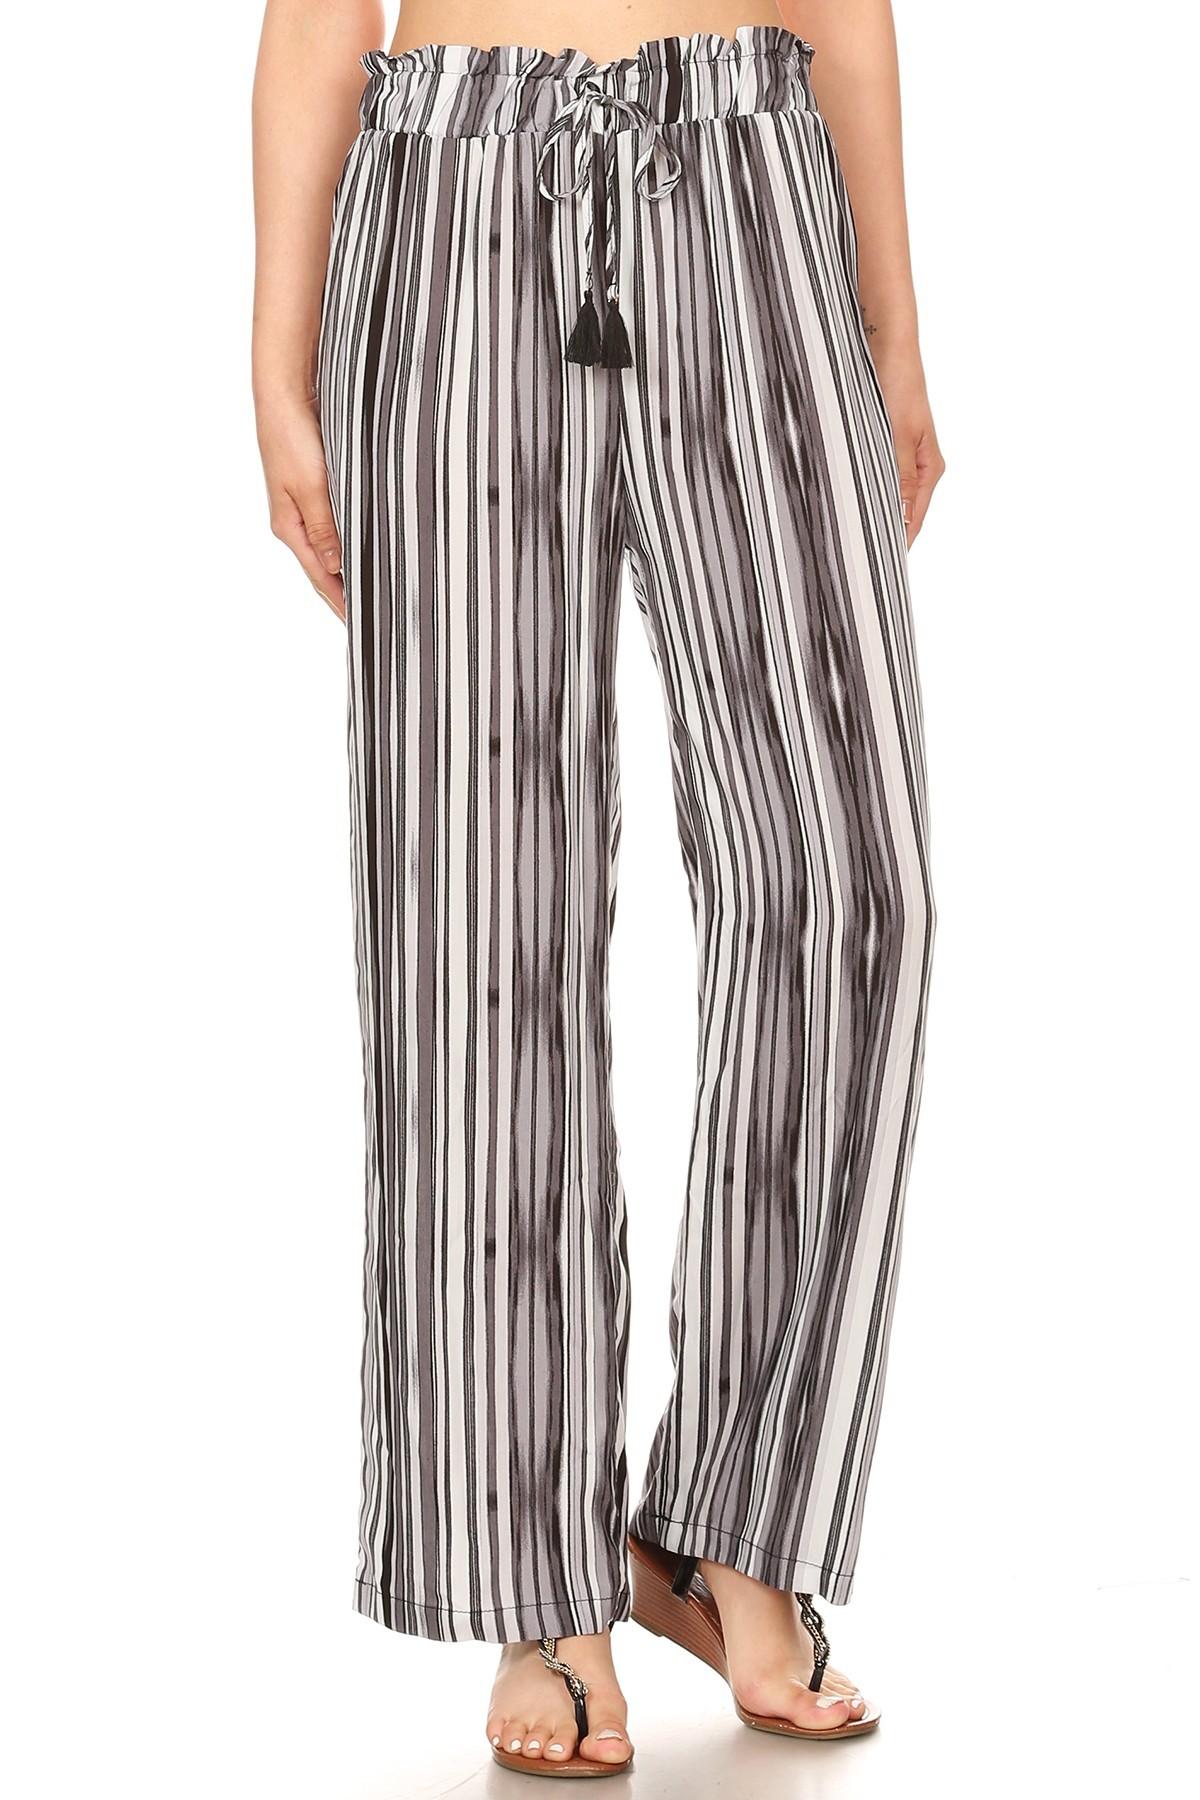 BLACK/GREY/WHITE STRIPE PRINT PAPER BAG WAIST STRAIGHT LEG PANTS#8SLP05-12